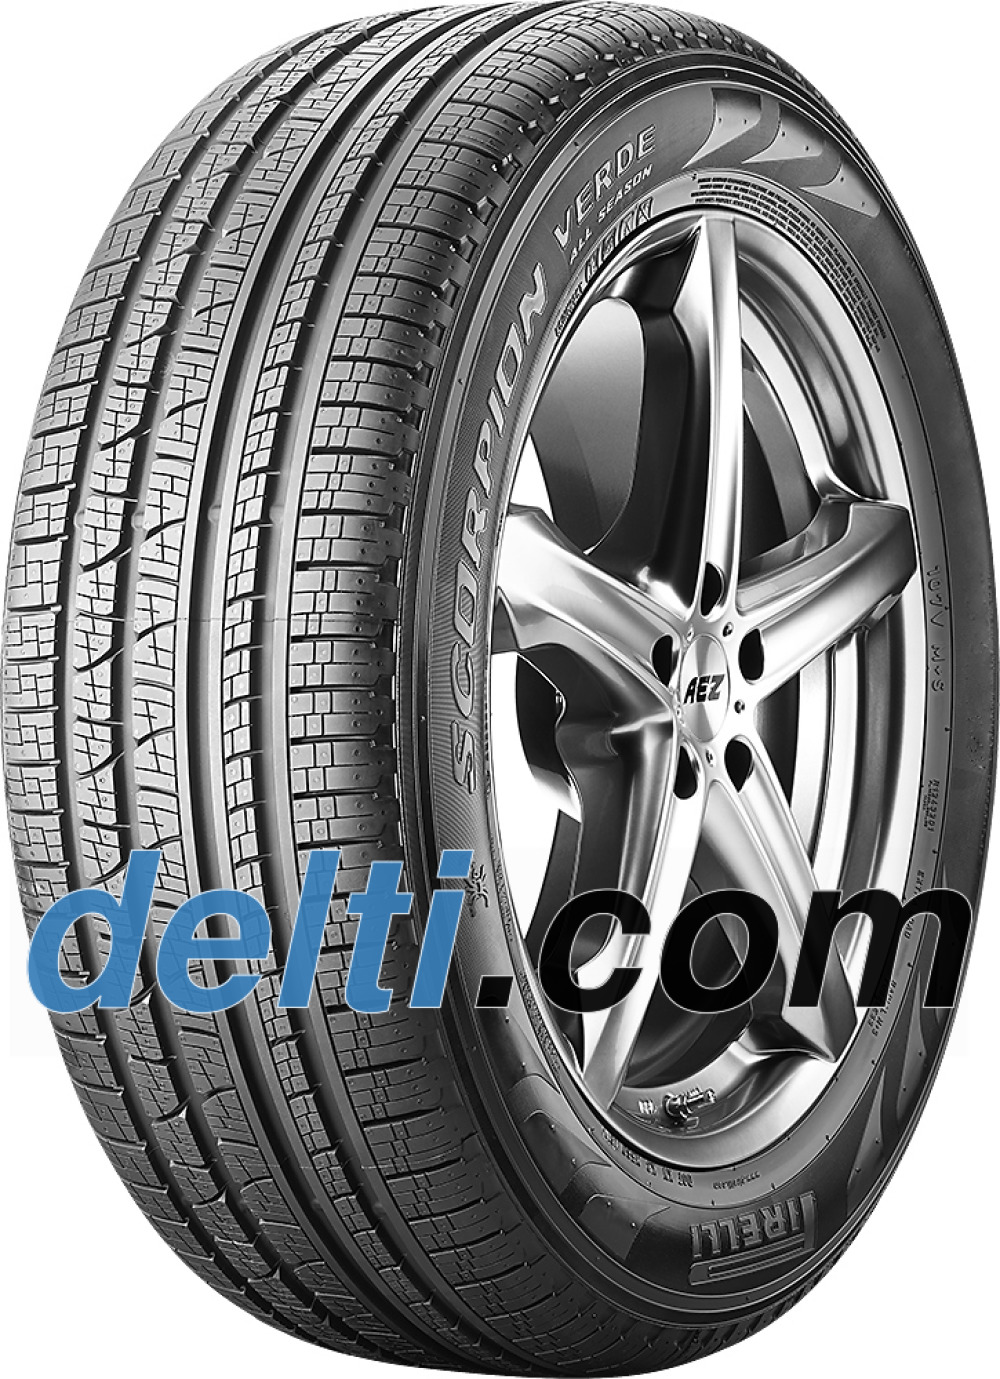 Pirelli Scorpion Verde All-Season ( 235/65 R19 109V XL ECOIMPACT, LR, with rim protection (MFS) )